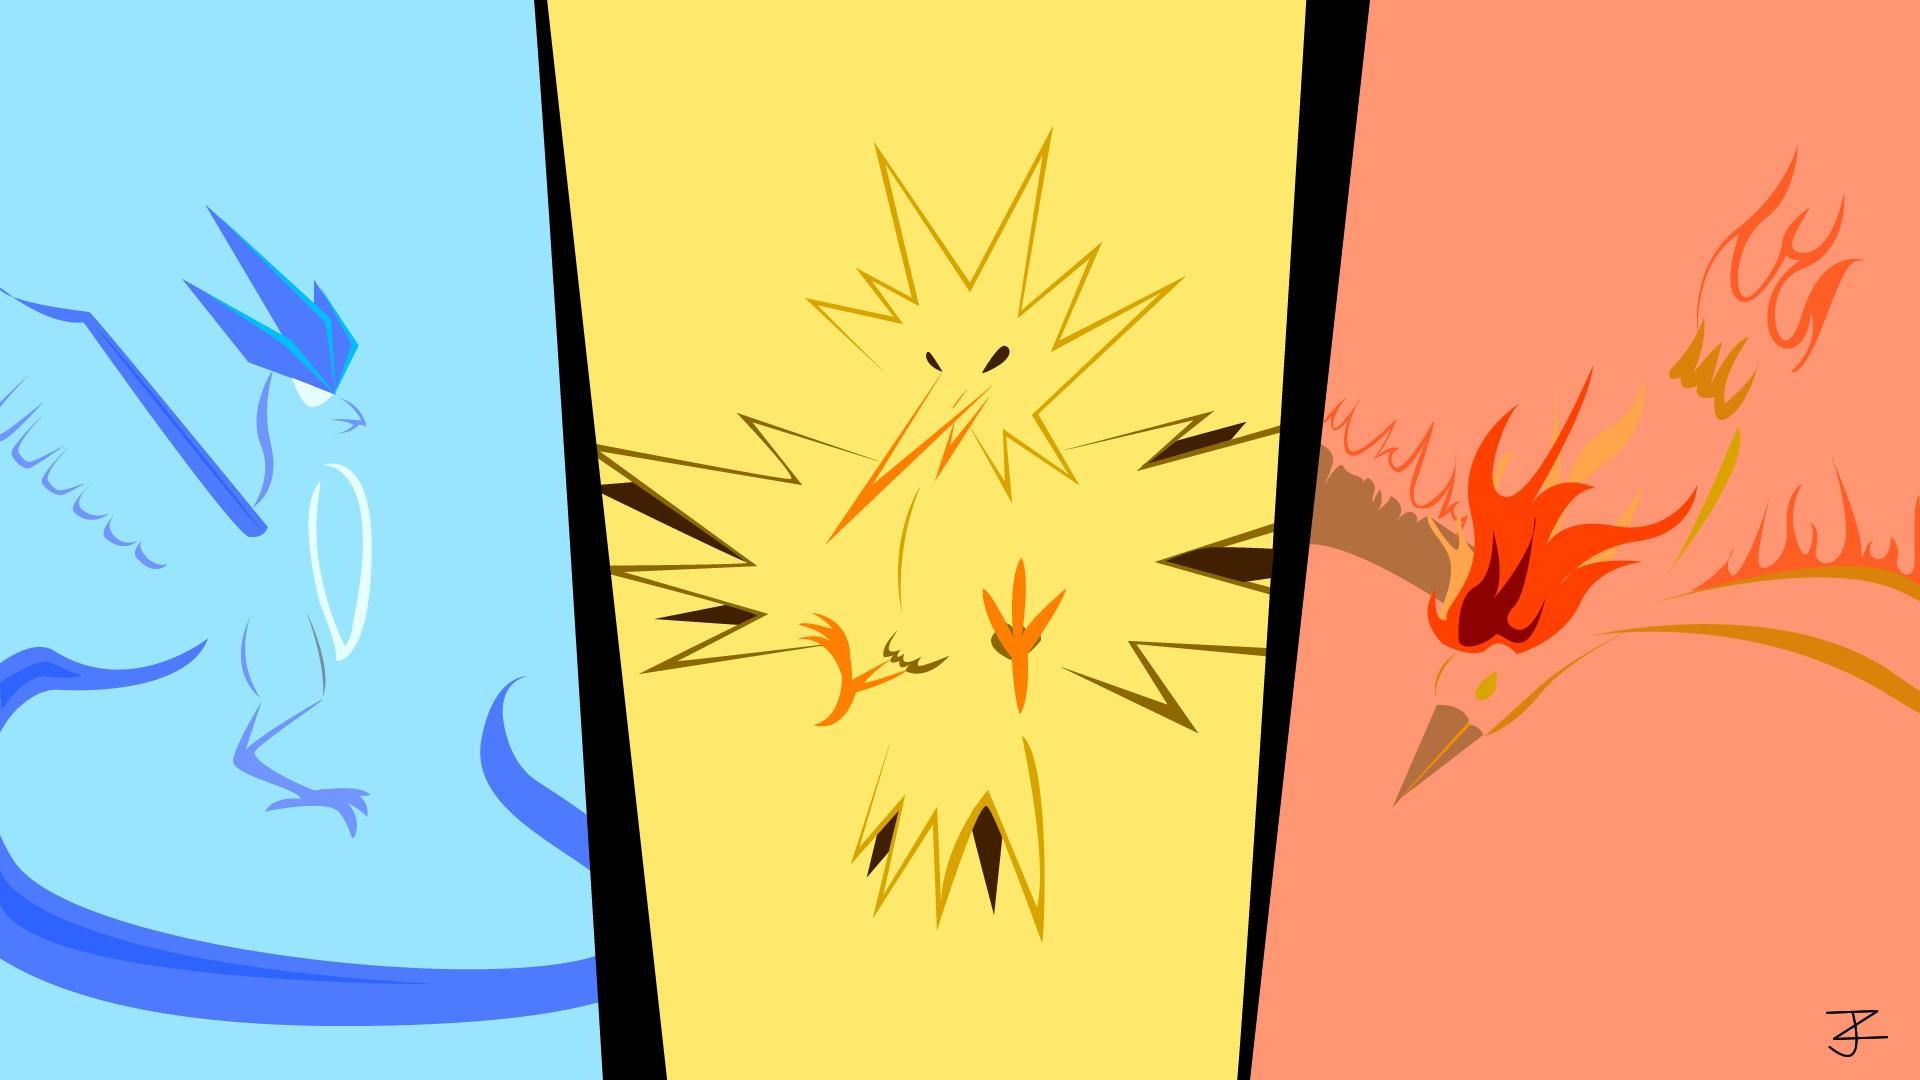 oc minimalist pokemon wallpaper! the legendary birds! - imgur